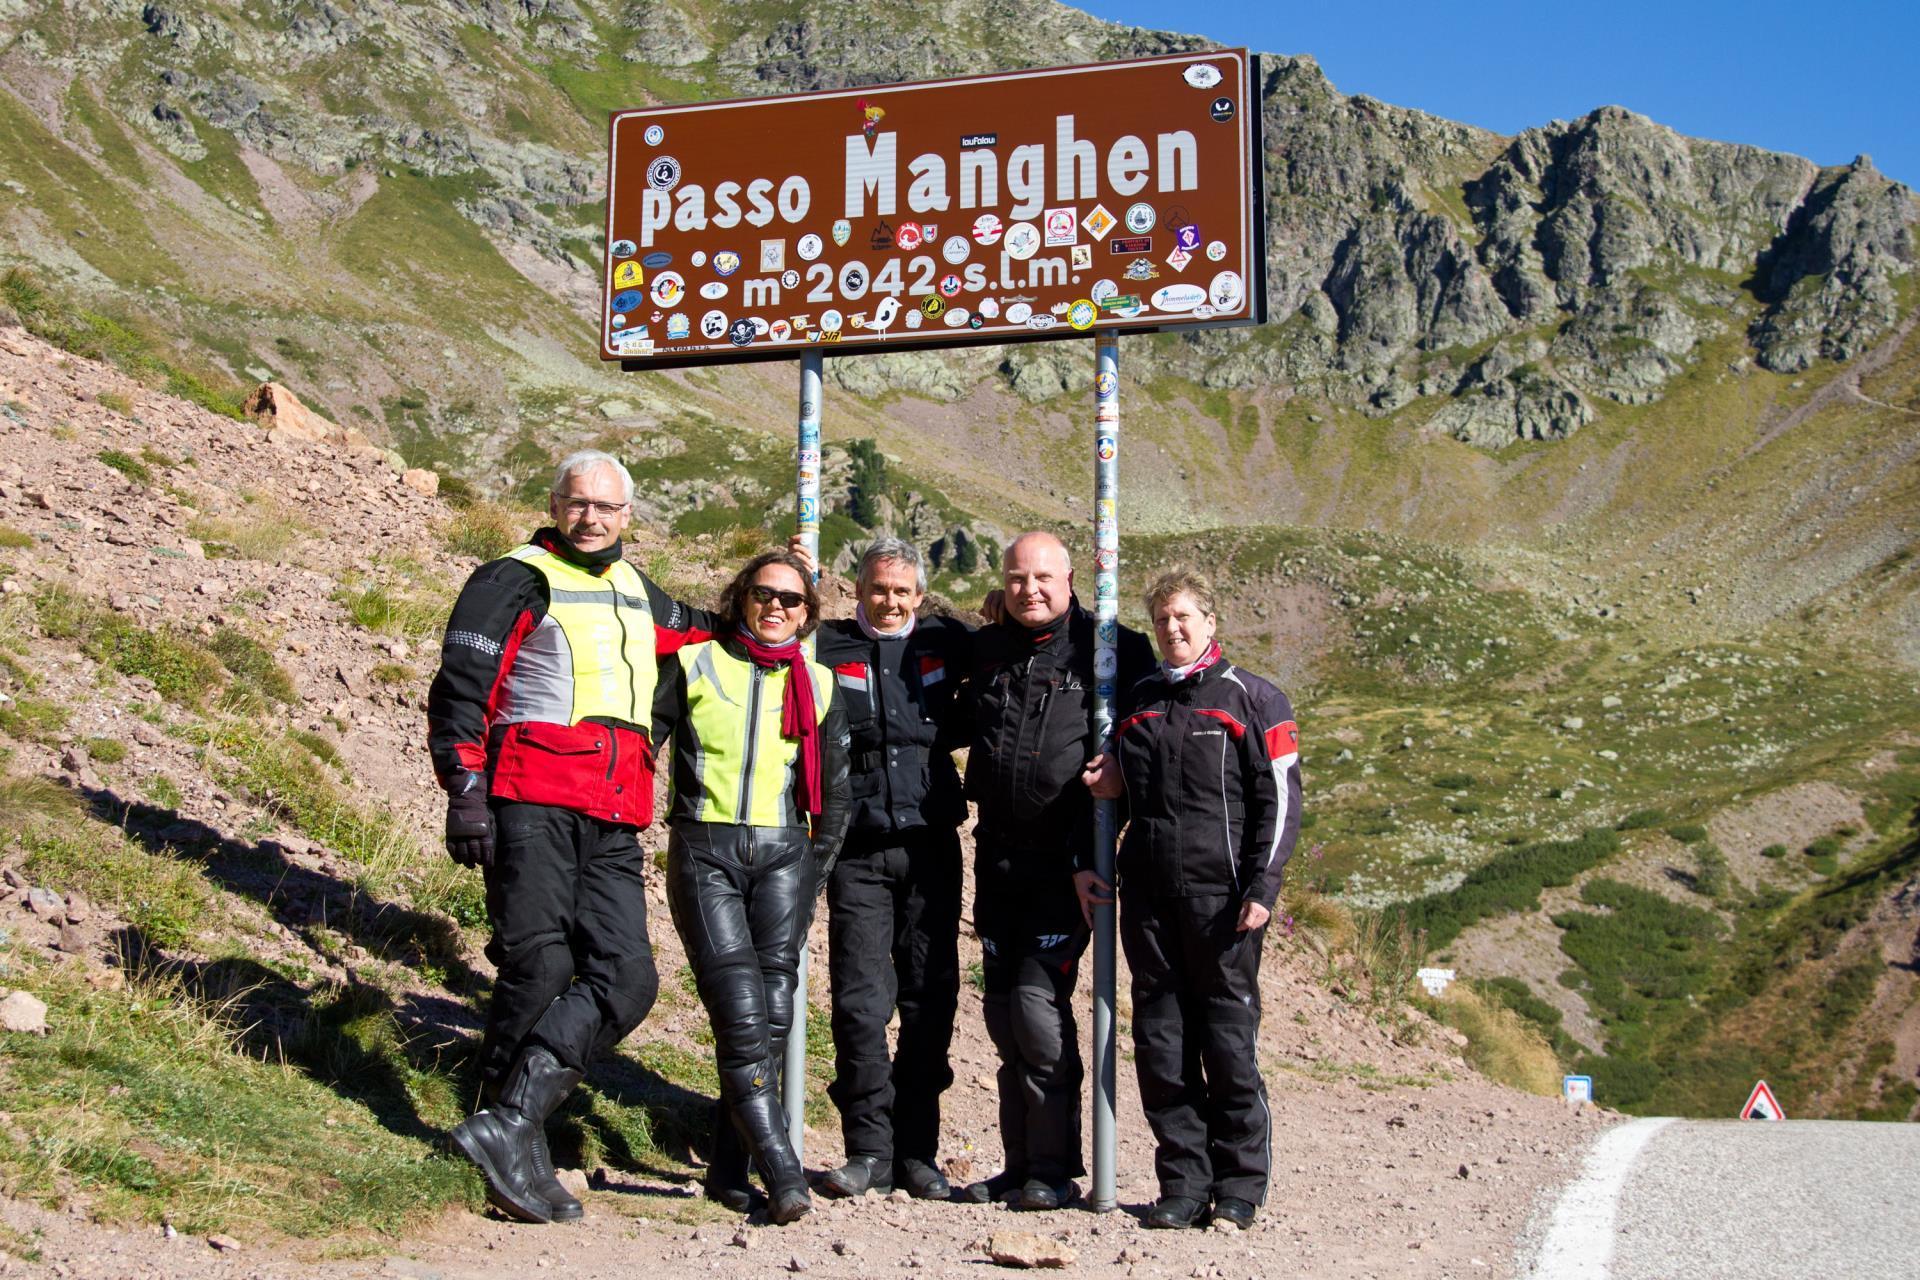 motorradtour-crucolo-manghenpass-27-08-12-9016